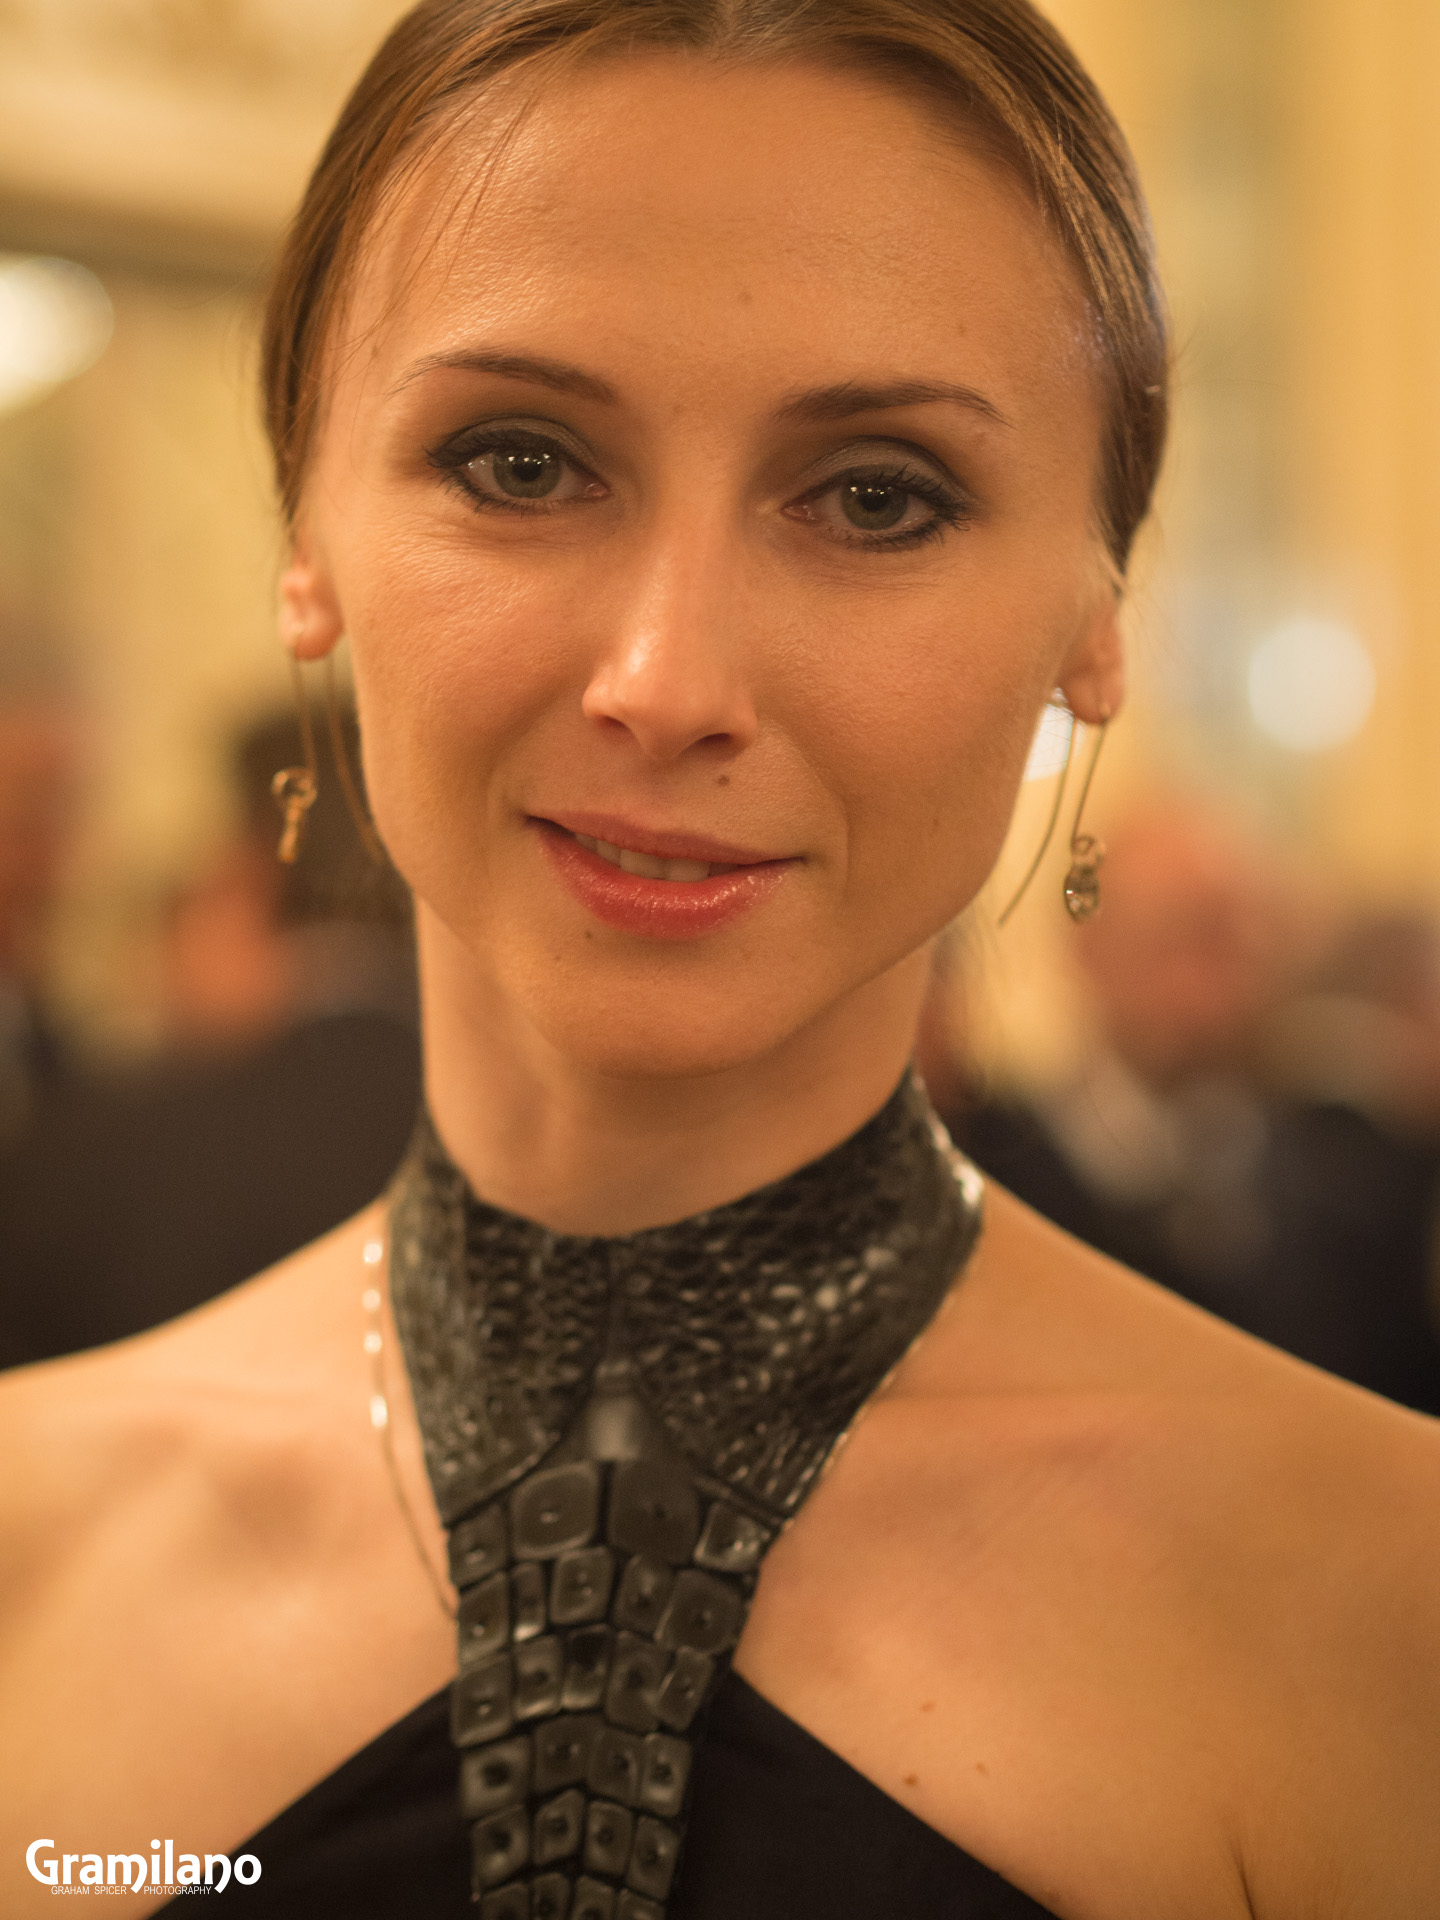 Svetlana Zakharova (Bolshoi Ballet, La Scala Ballet)